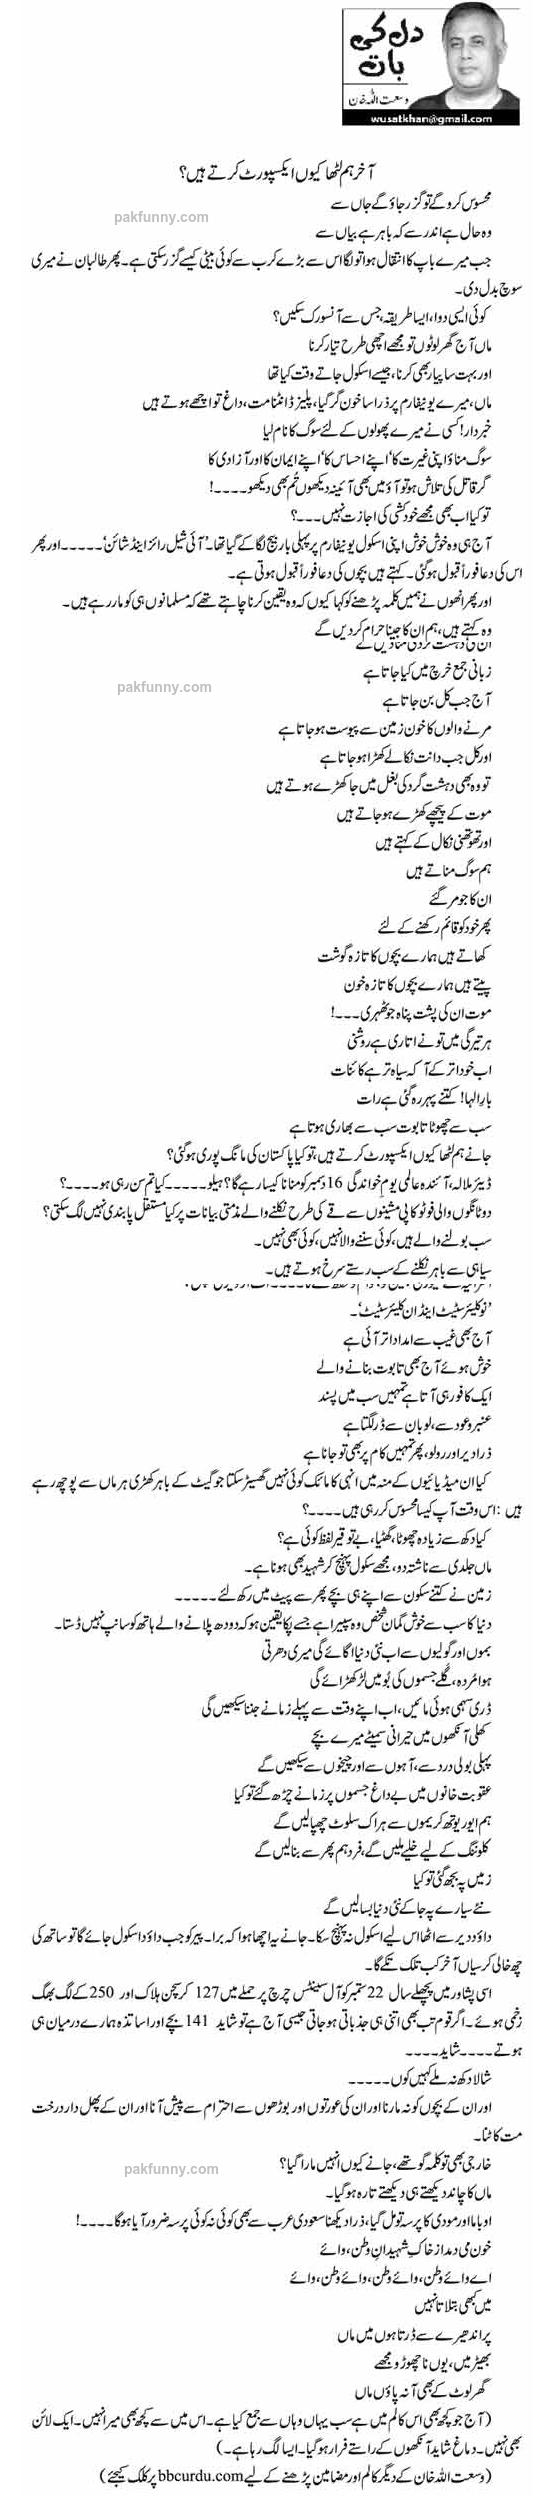 Akhir Hum Latha Keun Export Krty Hen Wusatullah Khan Pakfunny